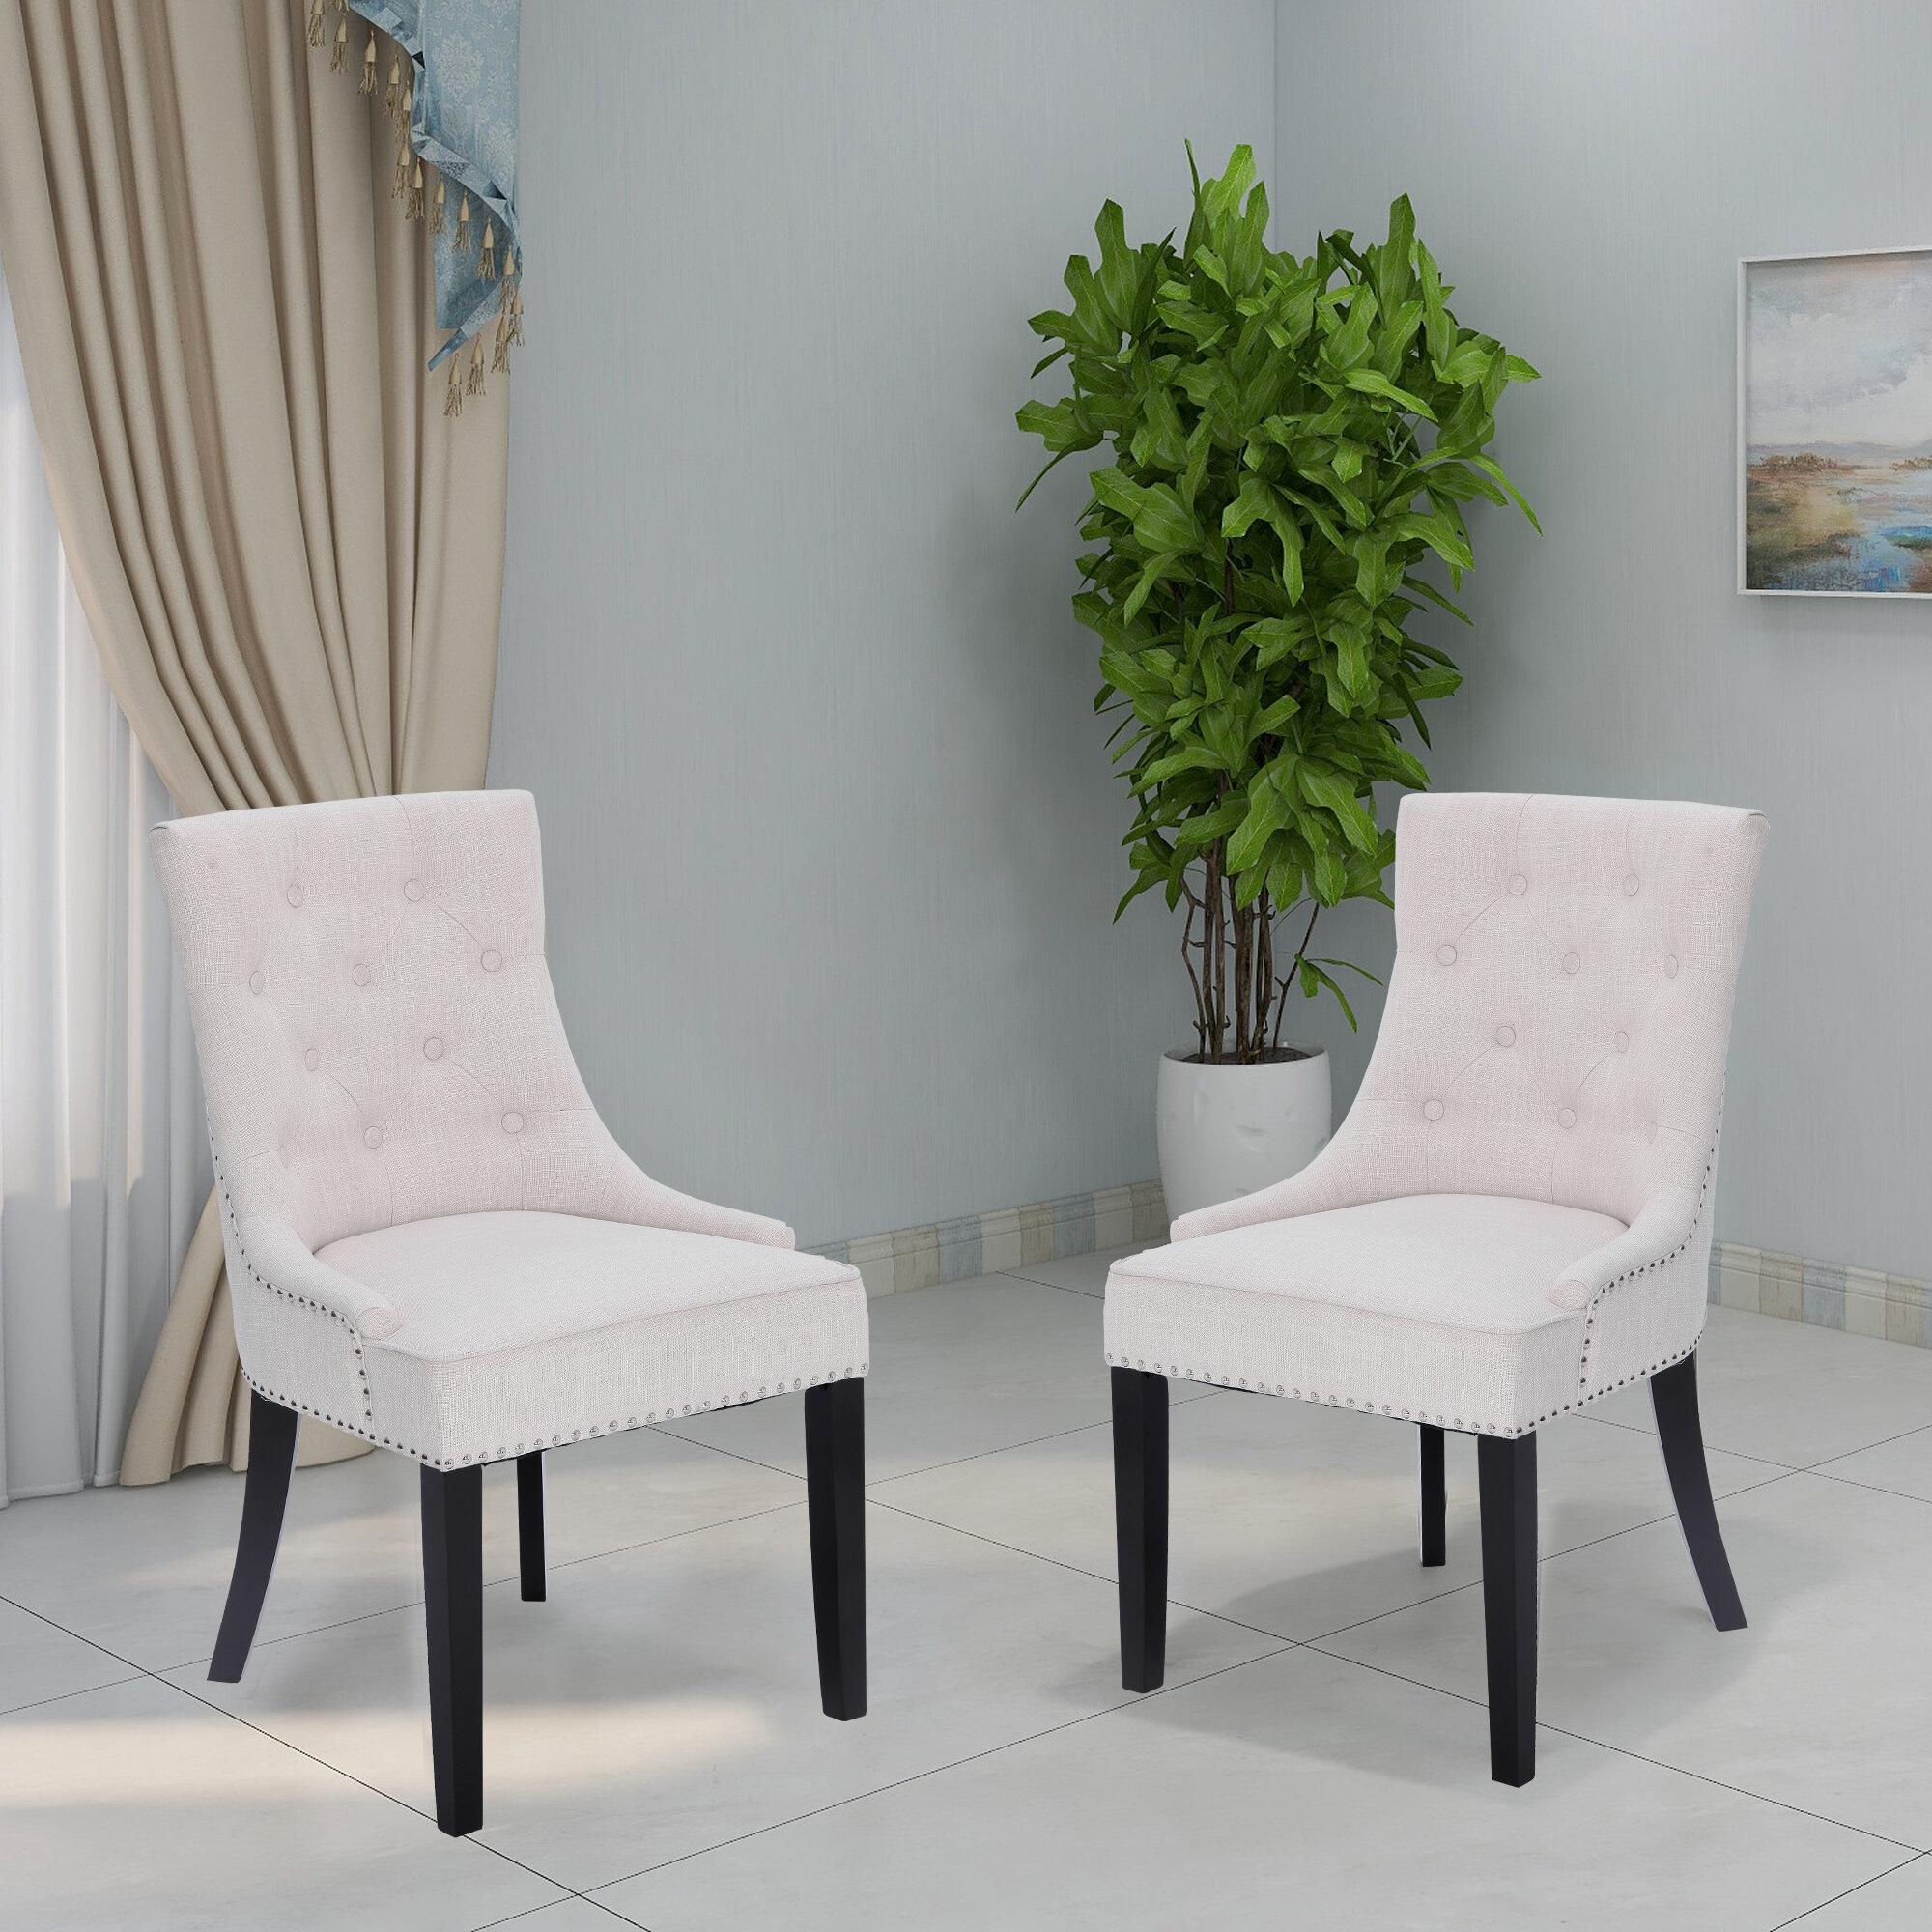 Alcott Hill Charlack Tufted Linen Upholstered Parsons Chair Reviews Wayfair